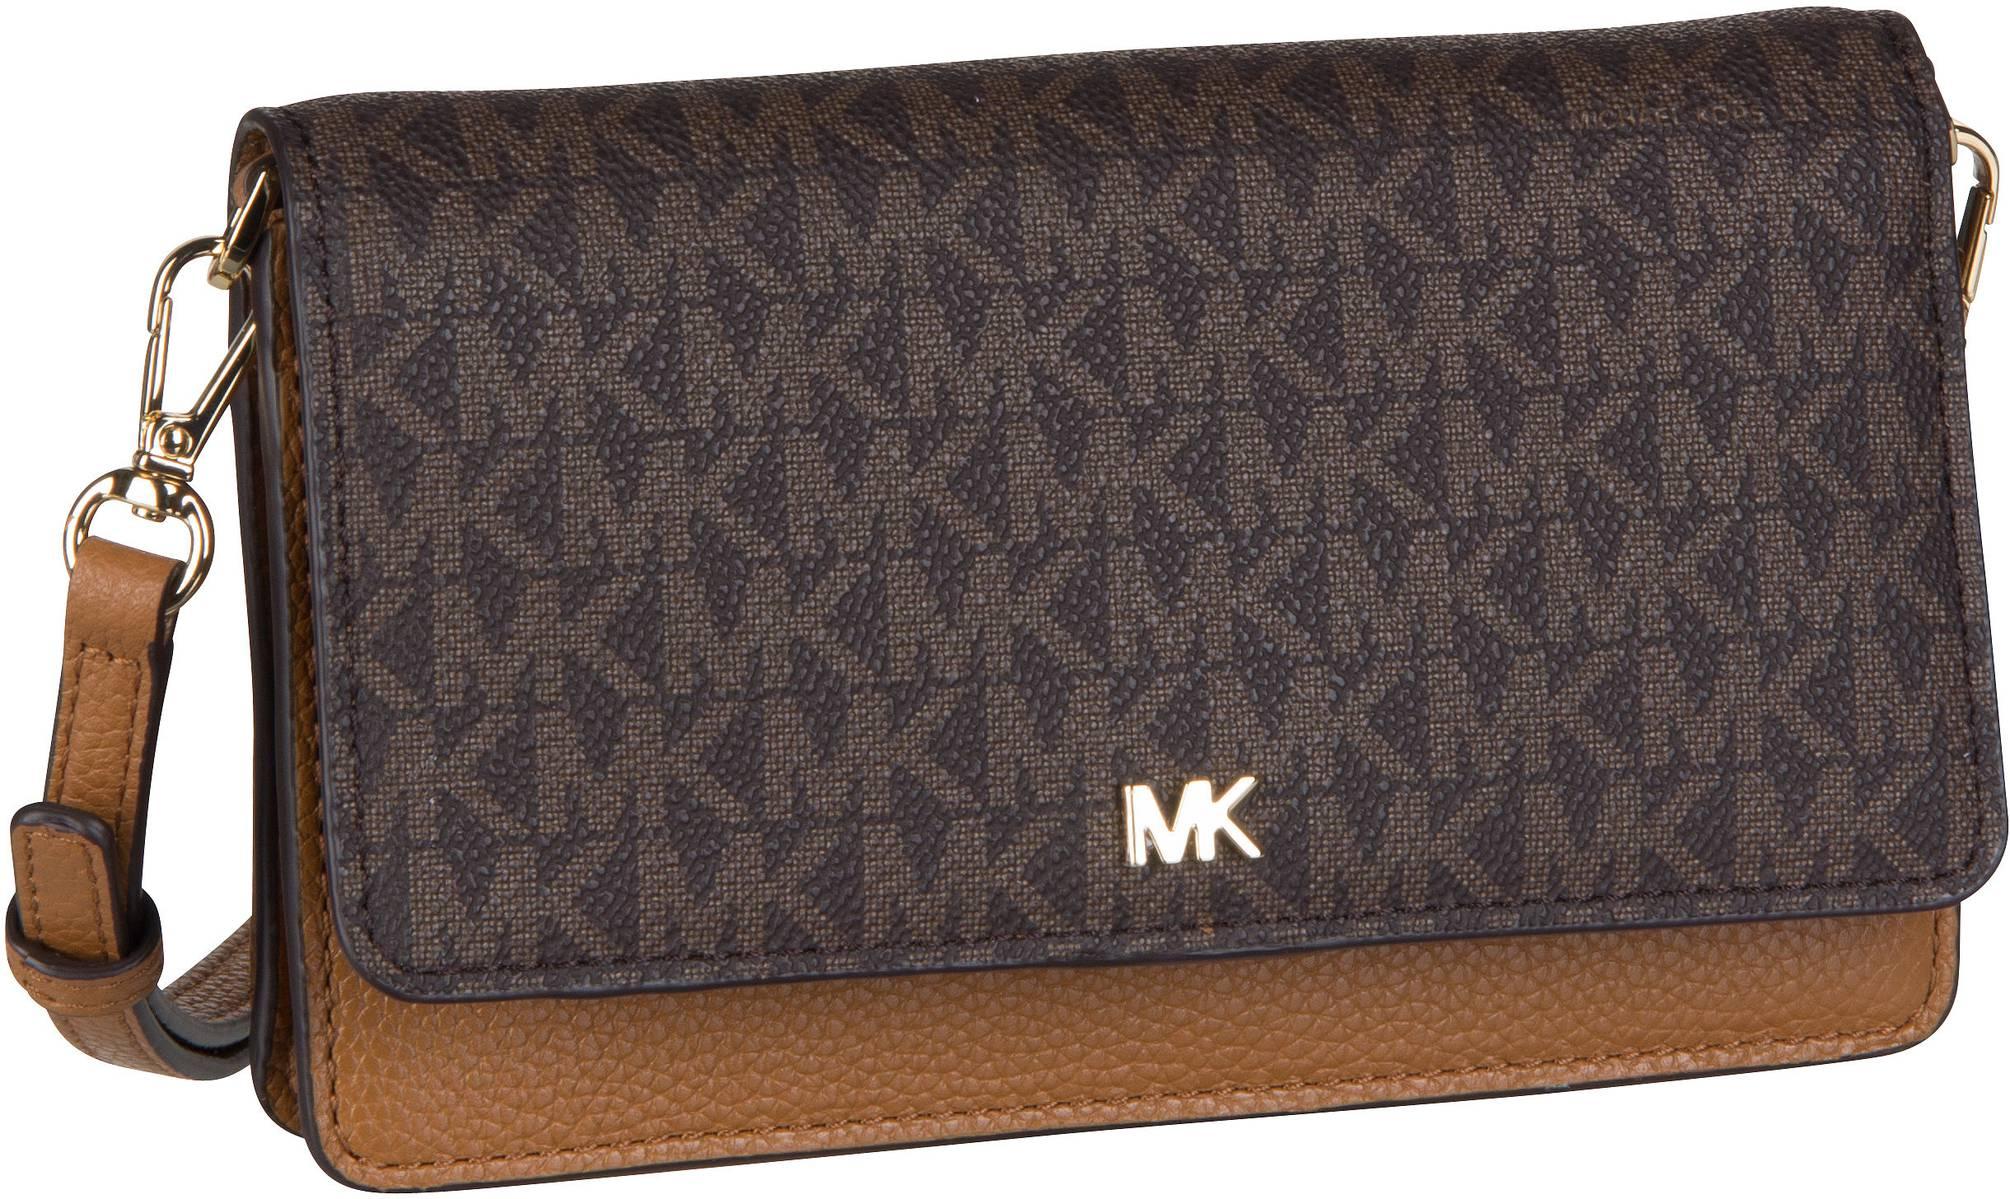 d73694899ba97 Michael Kors Handtasche Mott Phone Crossbody MK Signature Brown Acorn